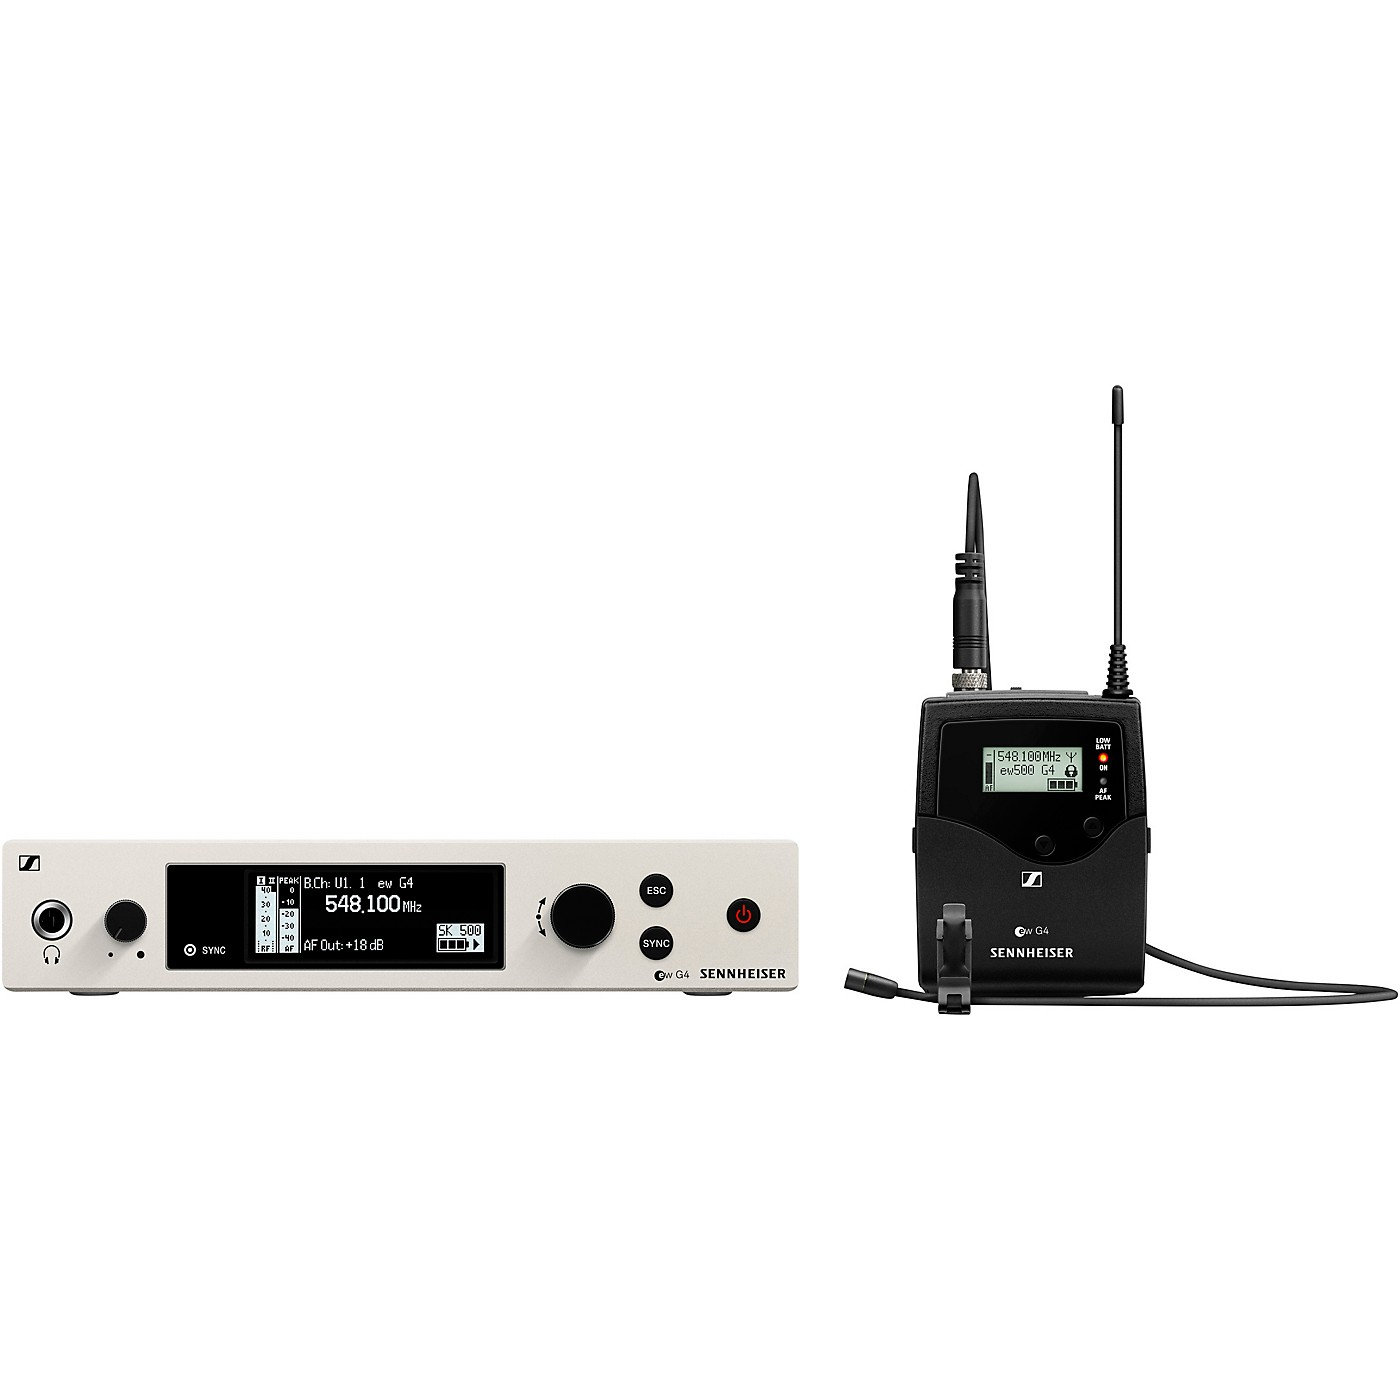 Sennheiser EW 500 G4-MKE2 Wireless Lavalier Microphone System thumbnail